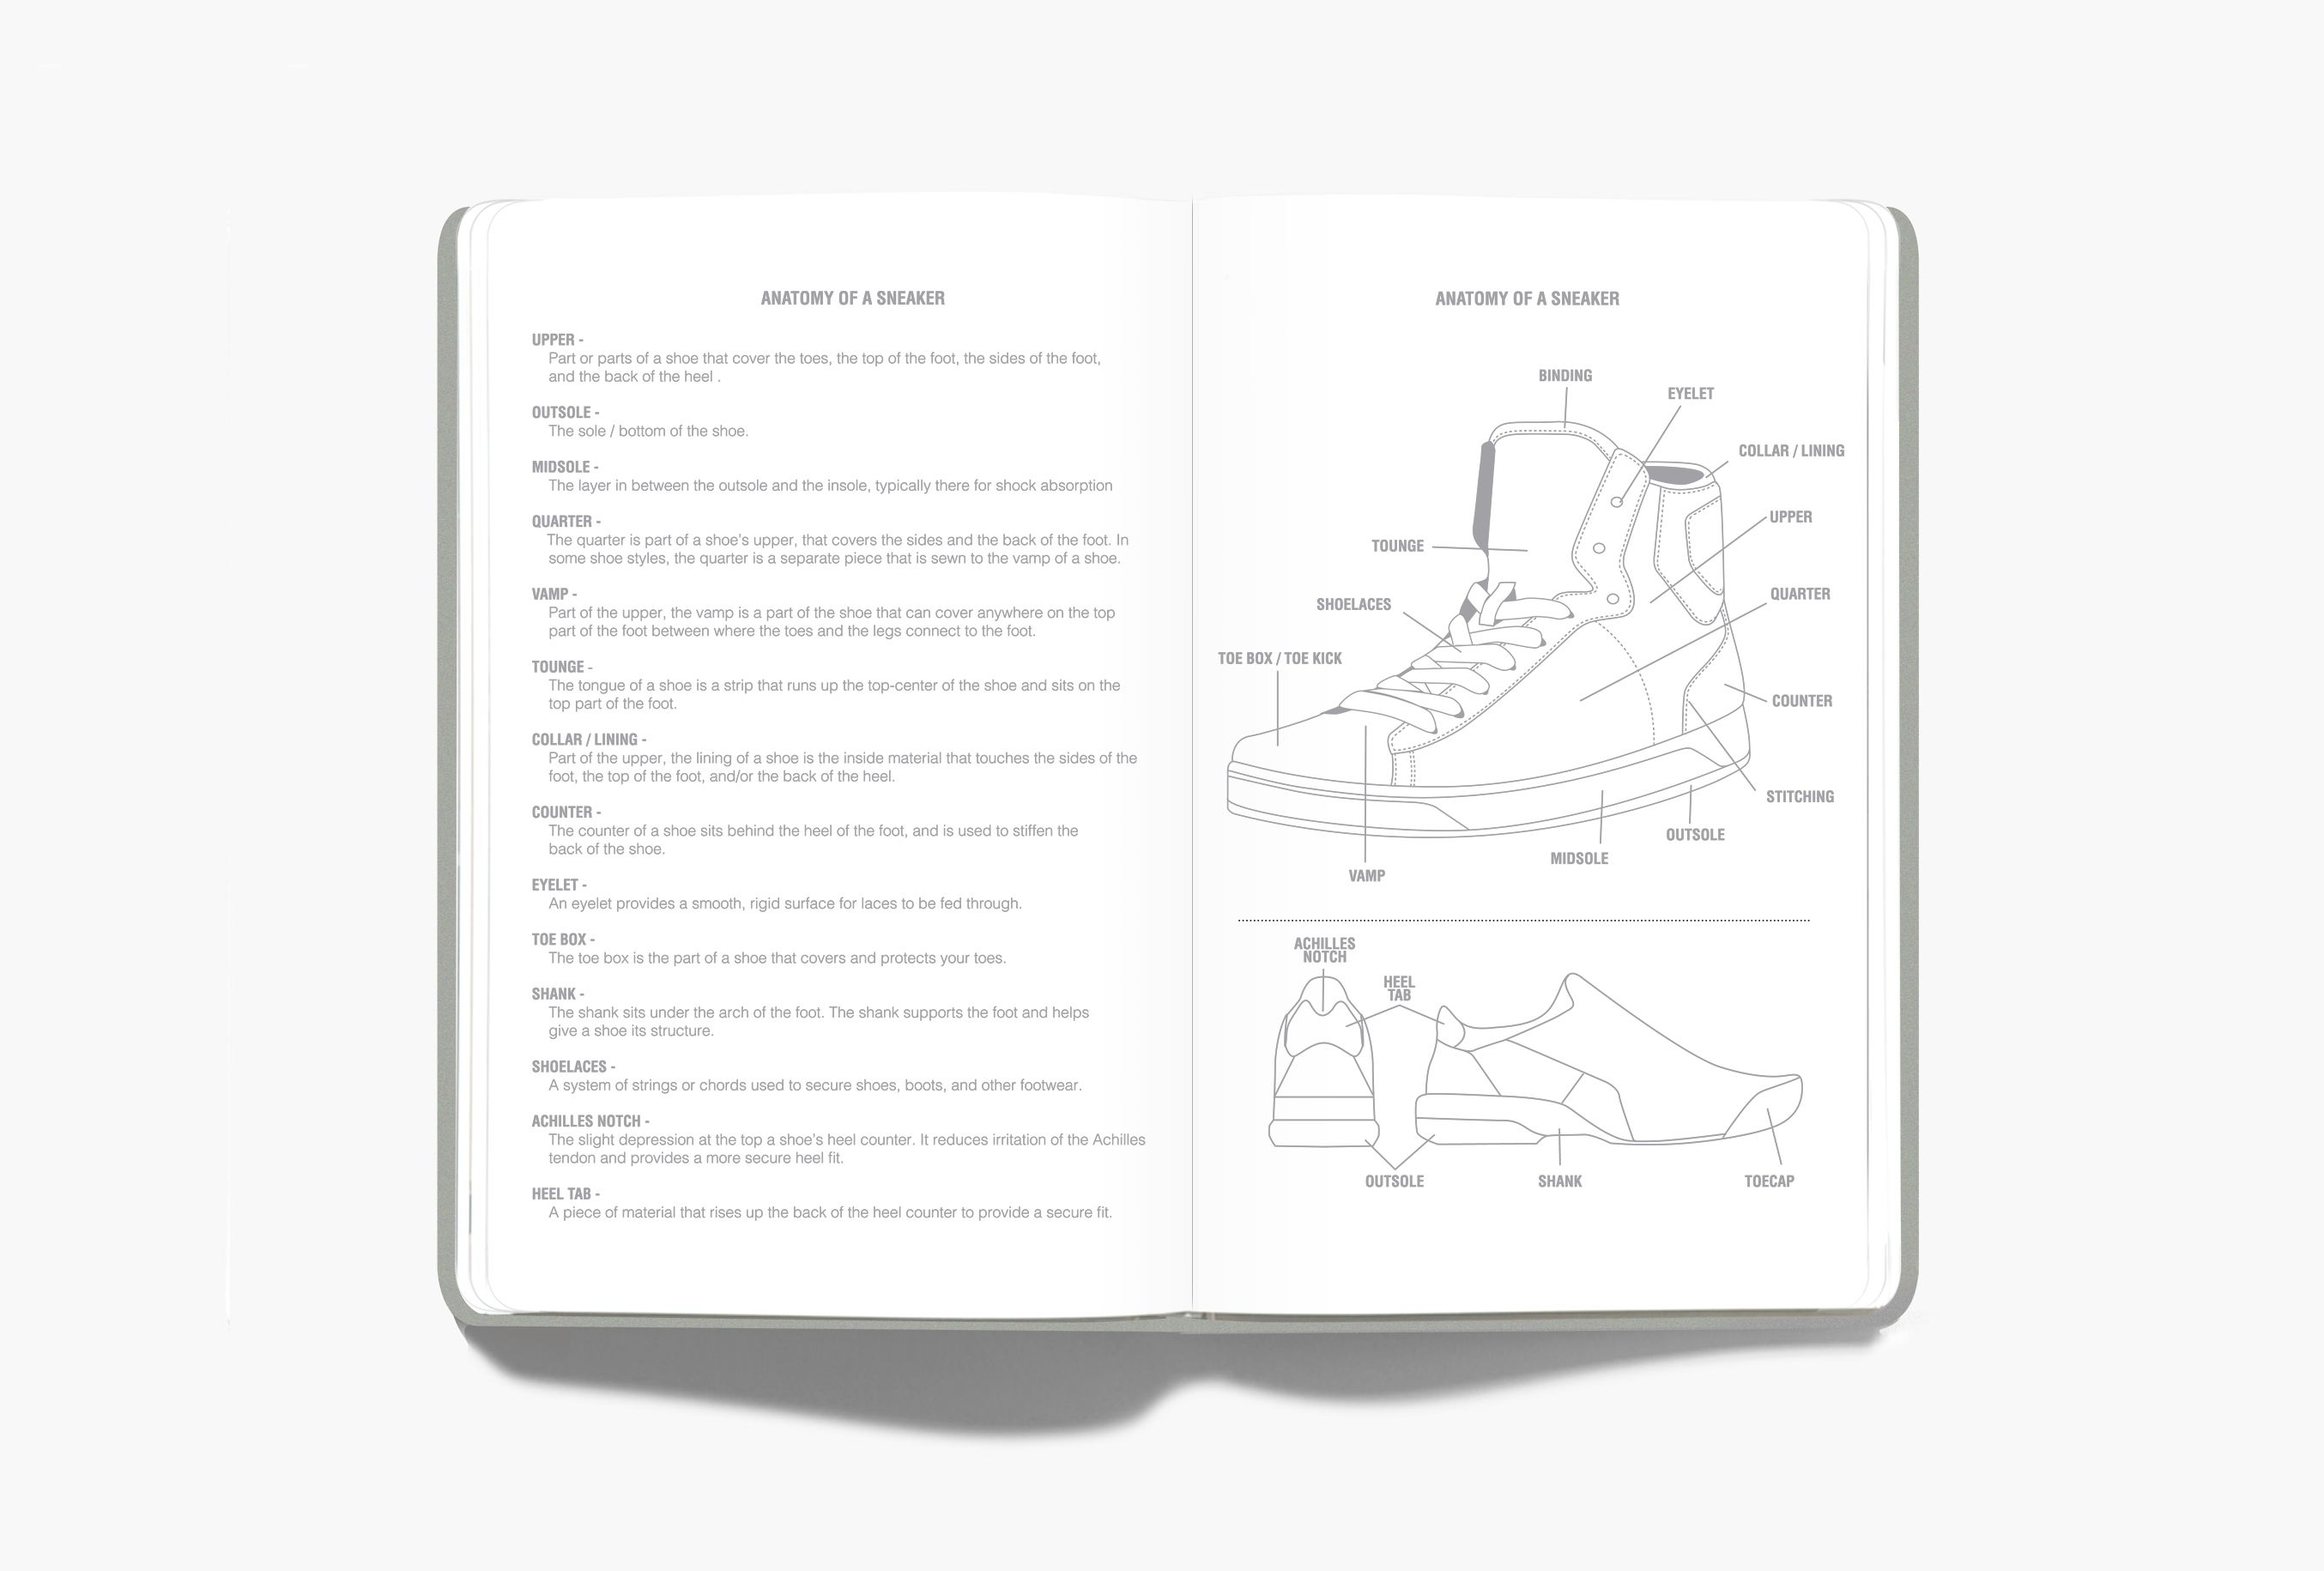 Sneaker_Palette_Anatomy | SNEAKER DESIGN | Pinterest | Footwear and ...